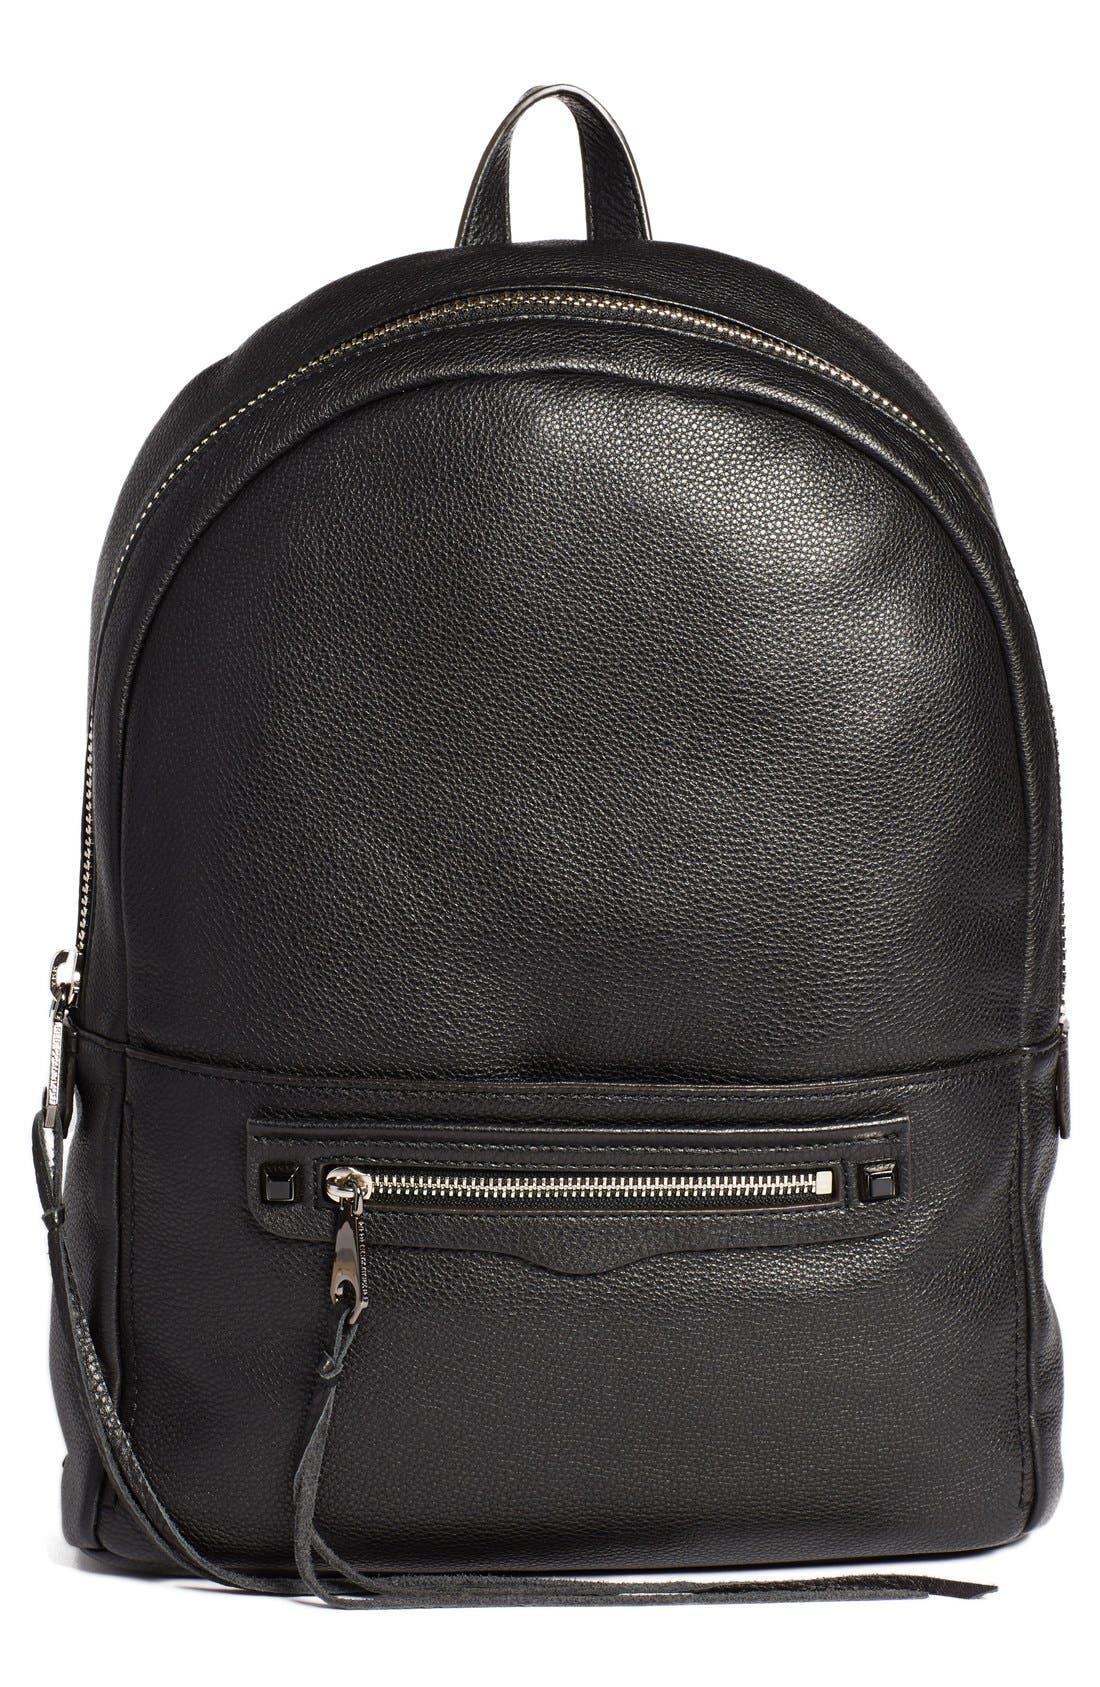 Alternate Image 1 Selected - Rebecca Minkoff 'Always On Regan' Leather Backpack